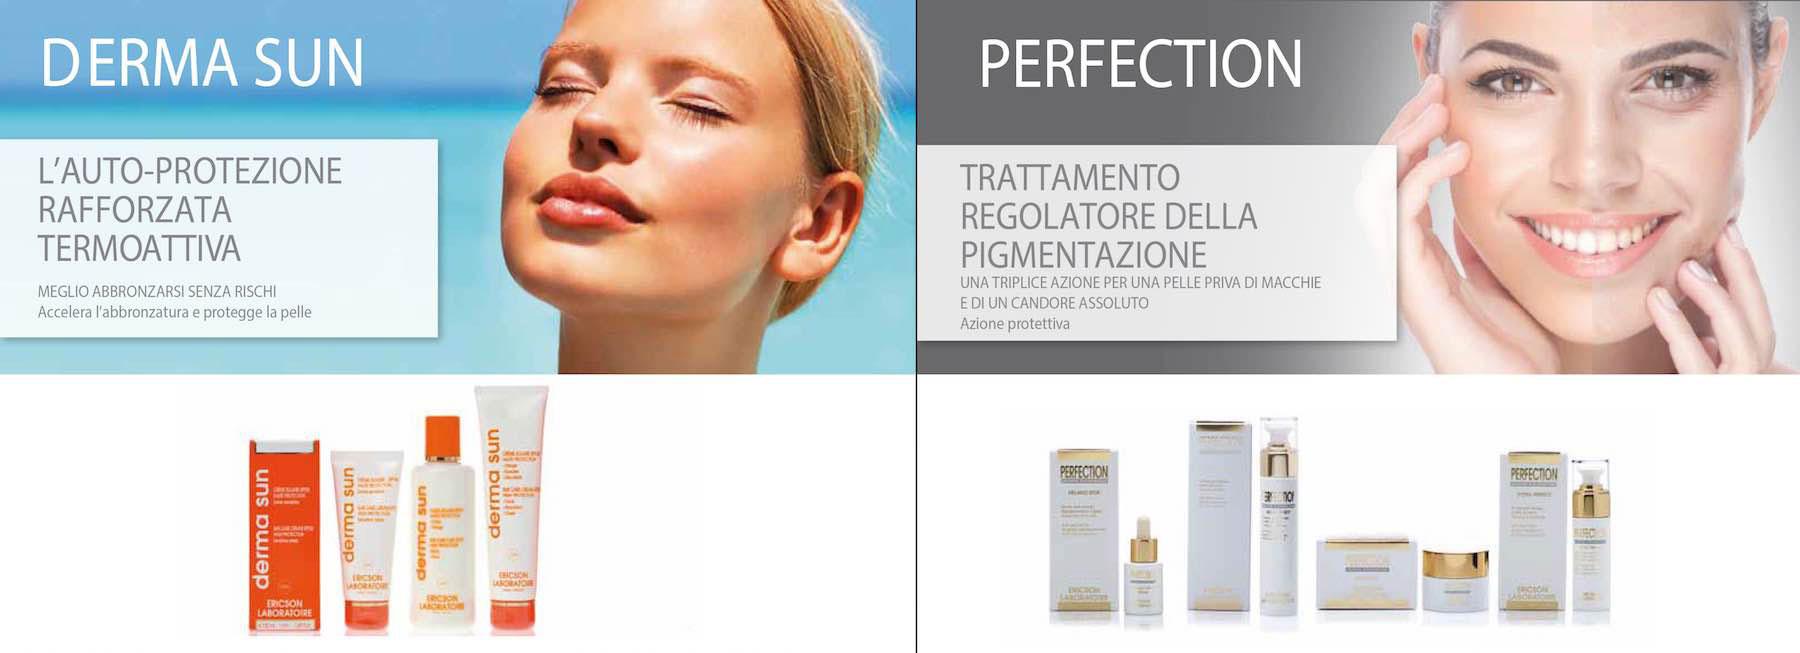 Jerà Beauty - Face-Ericson-Laboratoire-derma-sun-&-perfection-2